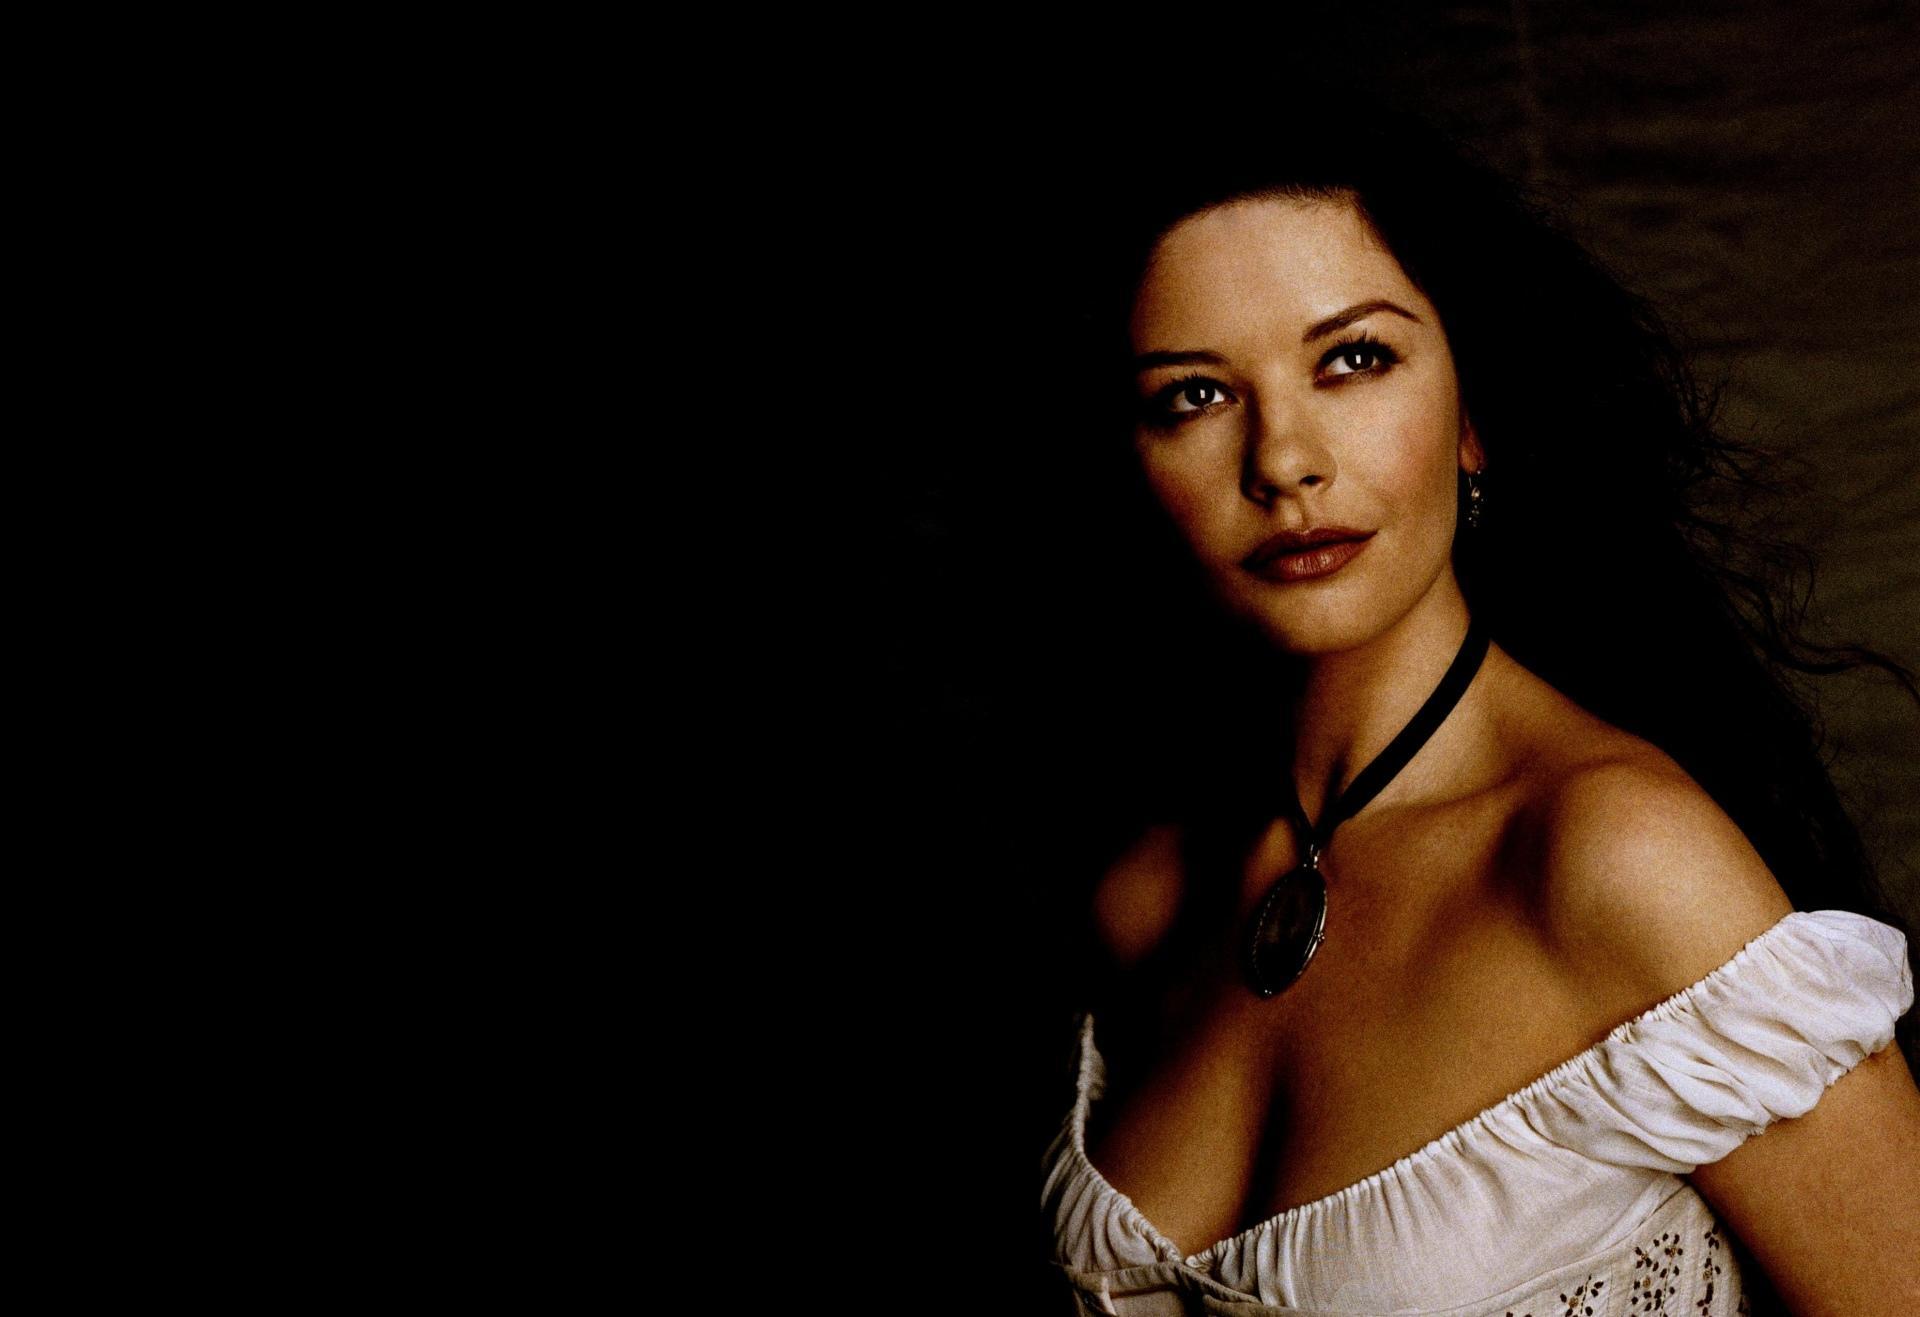 Catherine Zeta-Jones wallpapers HD quality